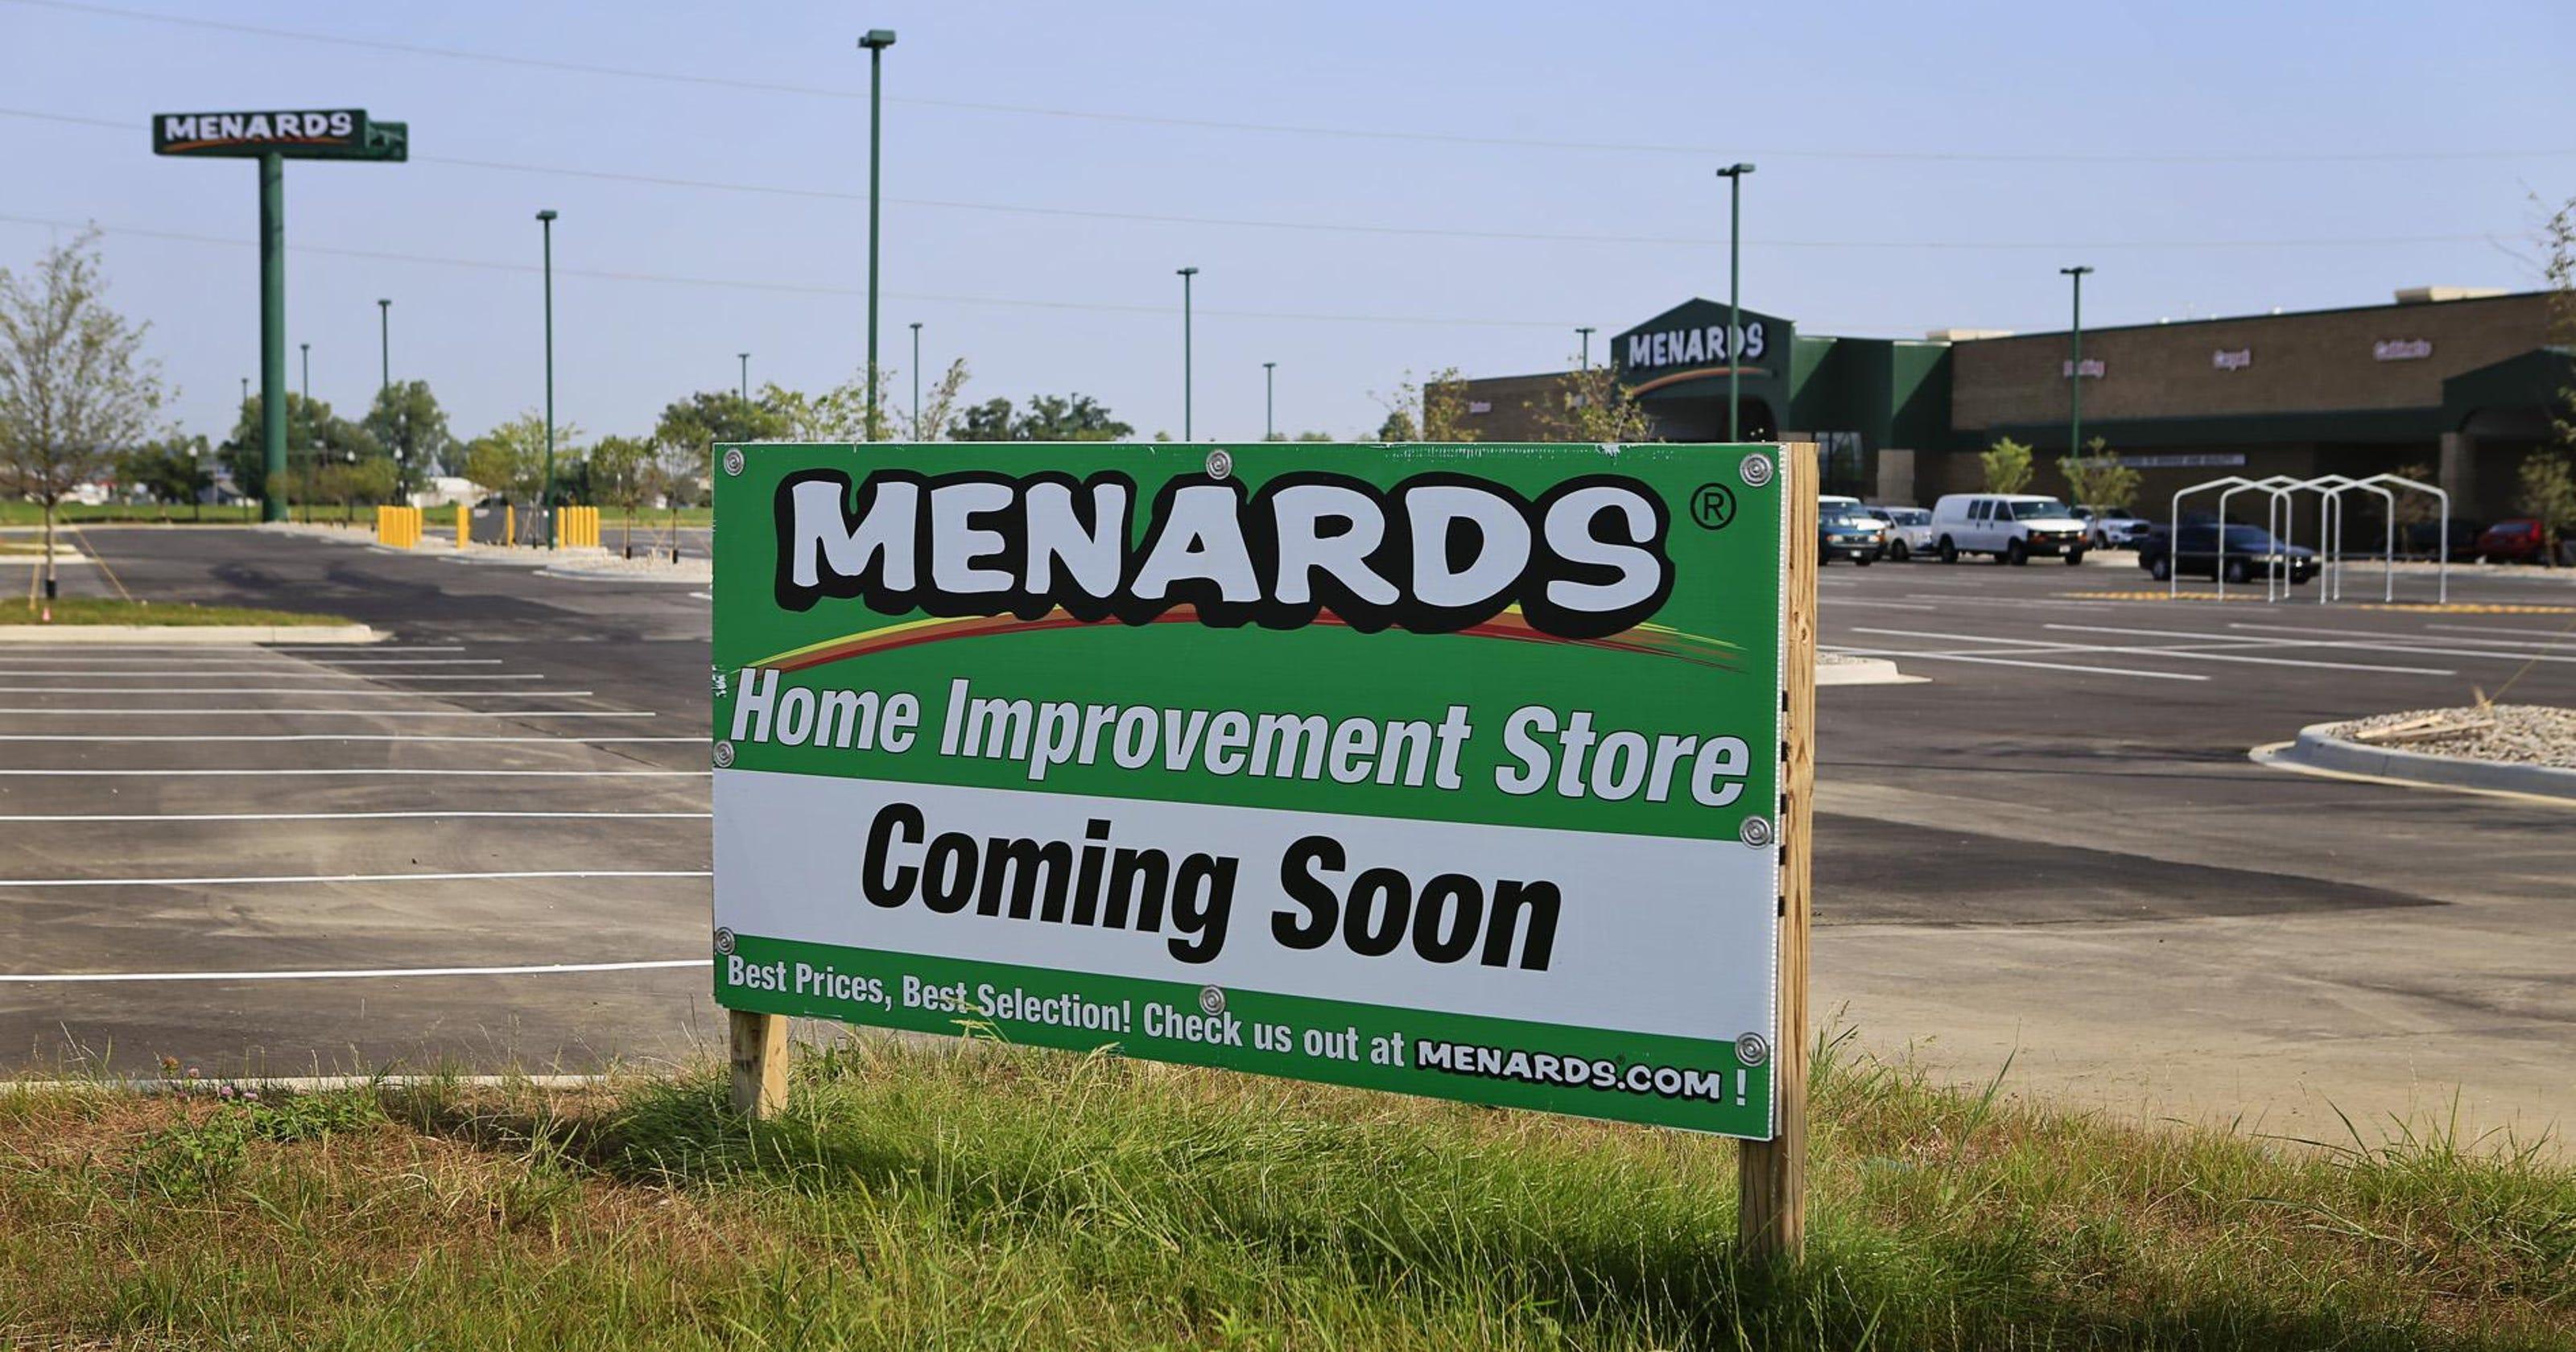 Plans for Louisville's first Menards advance